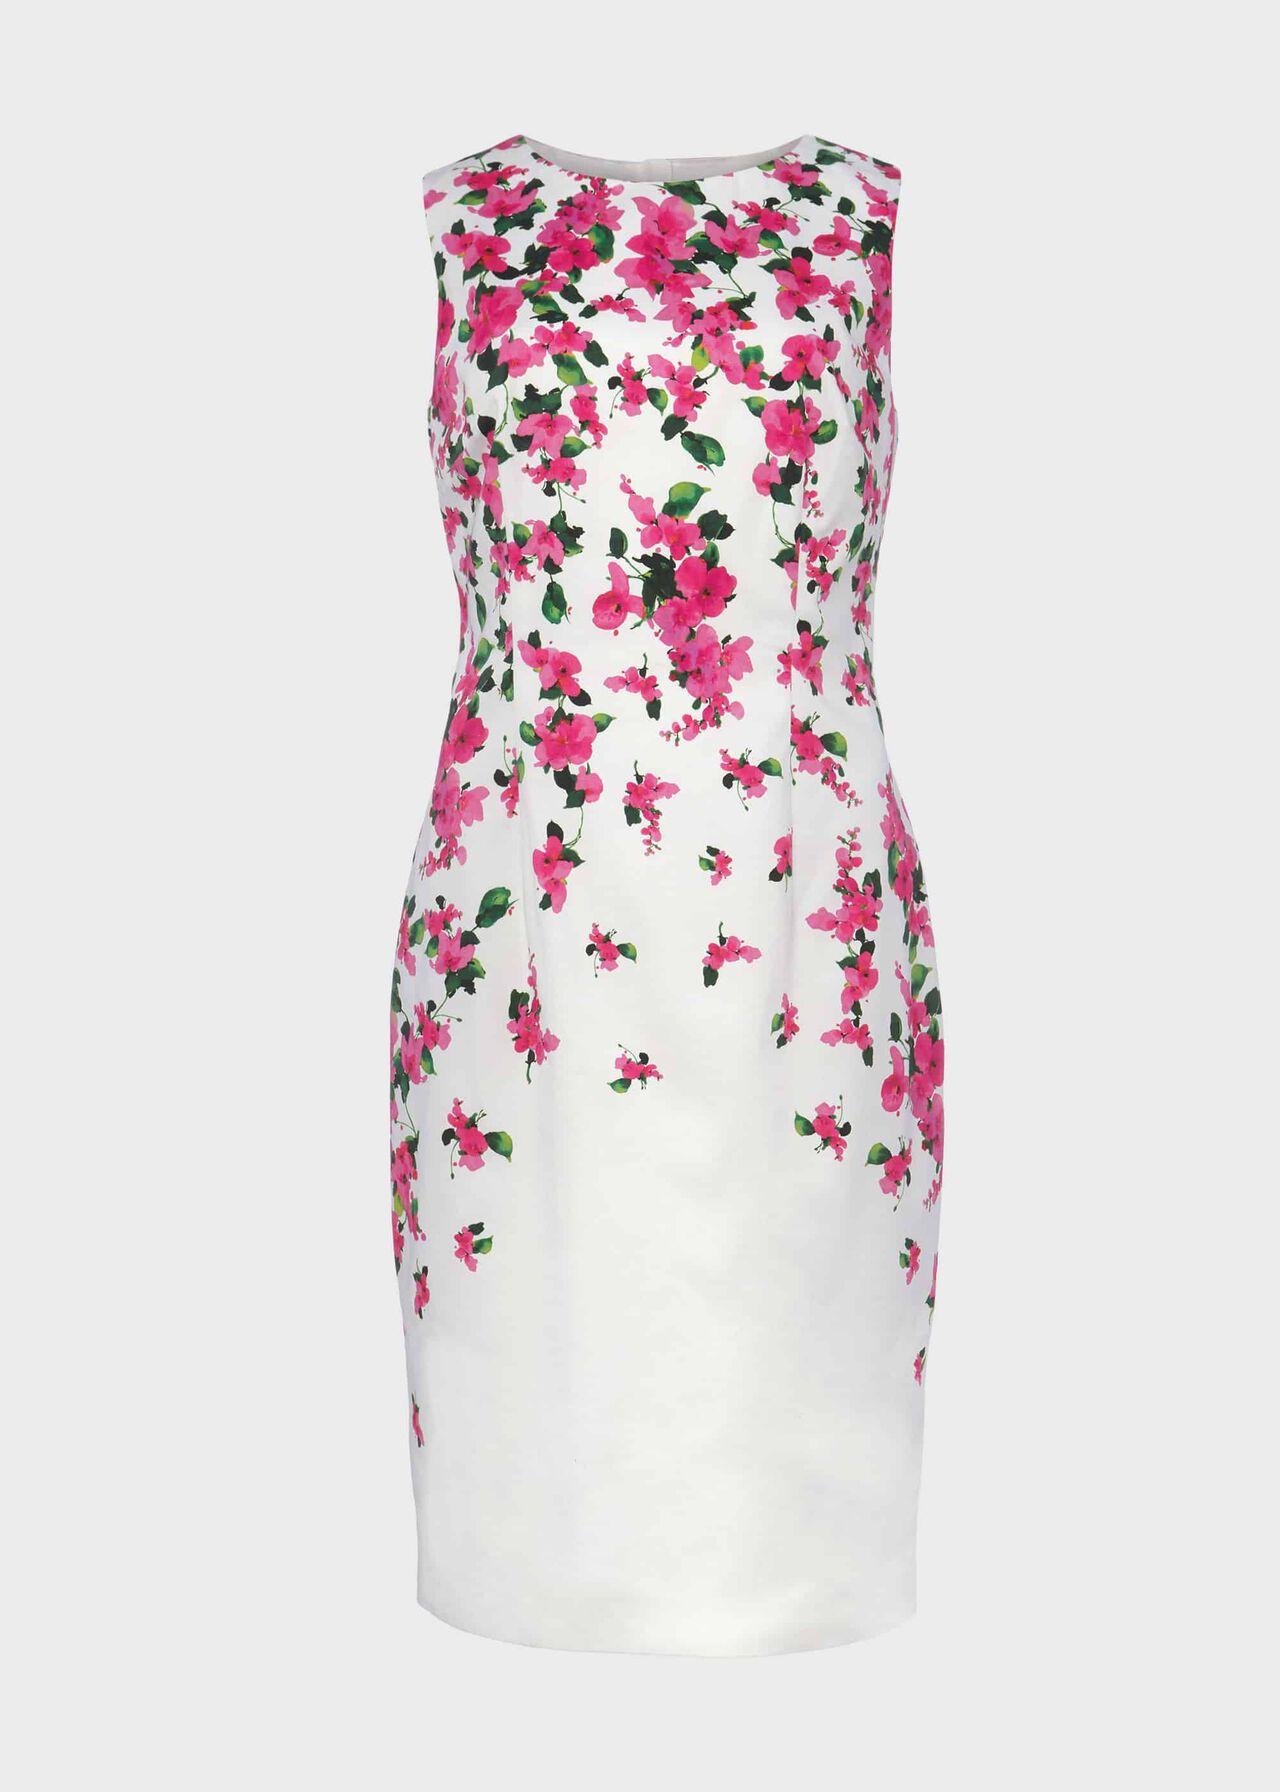 Fiona Cotton Blend Shift Dress Ivory Fuchsia